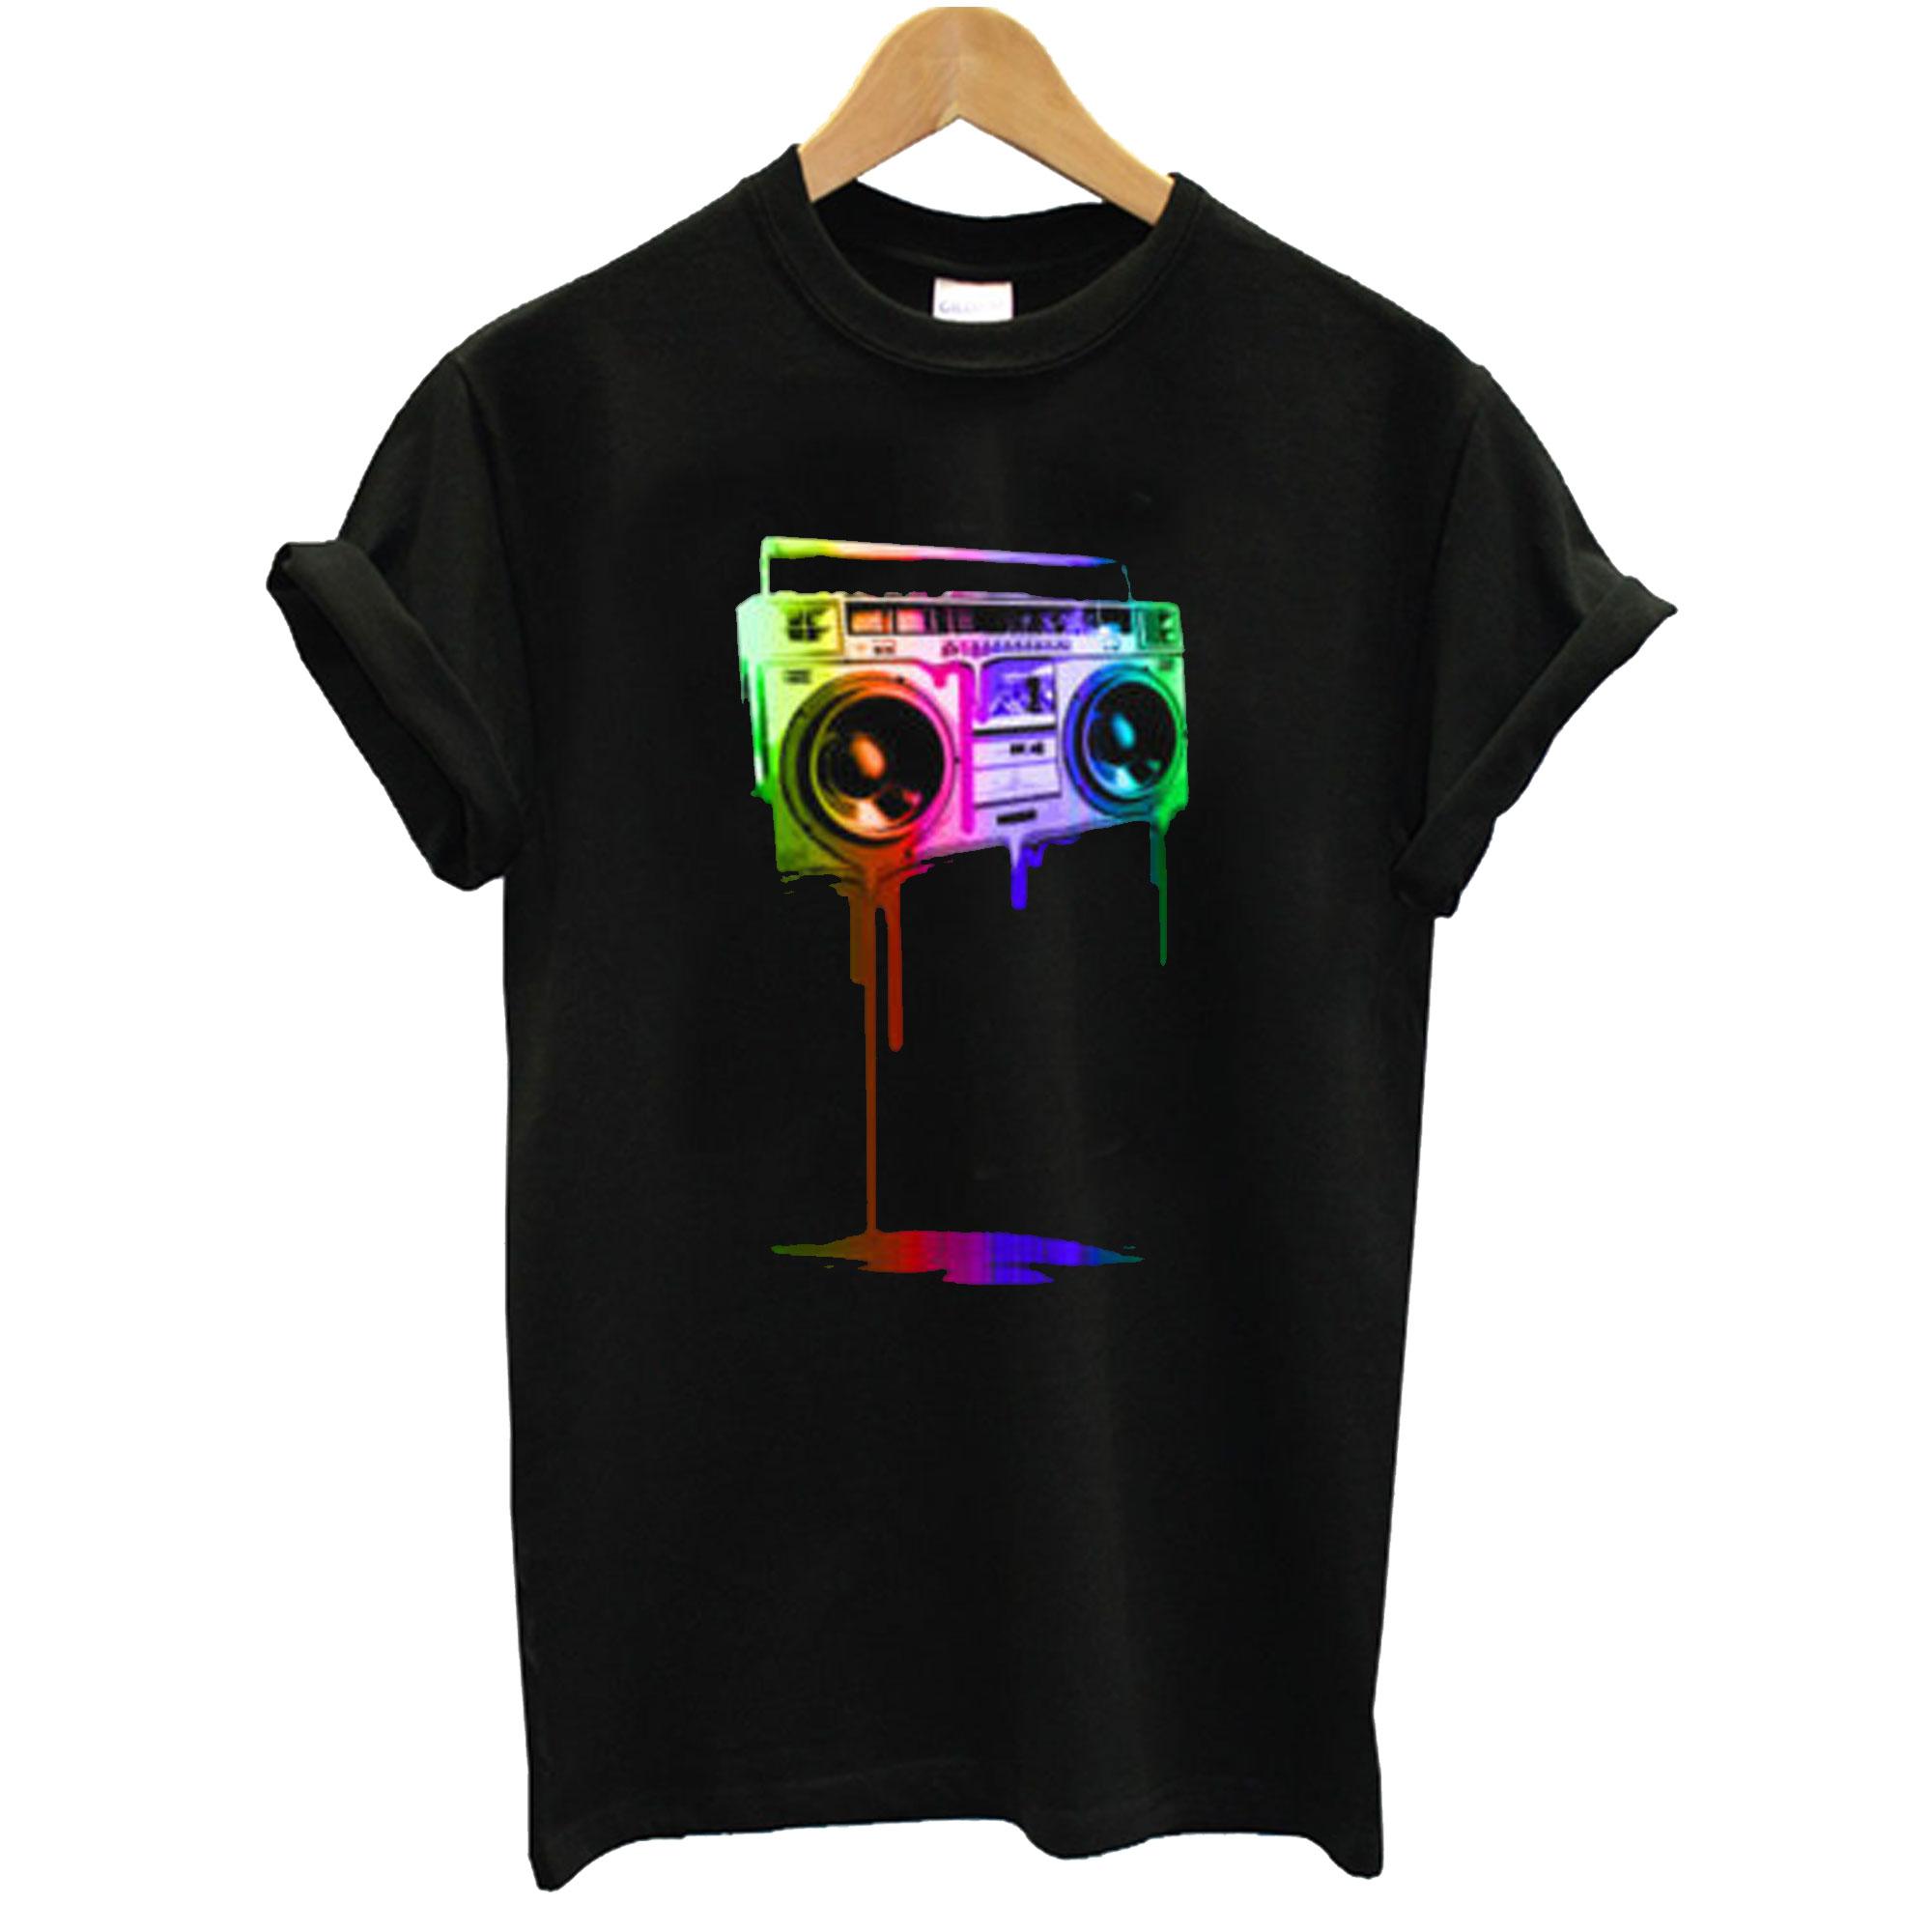 Melting Boombox T-Shirt